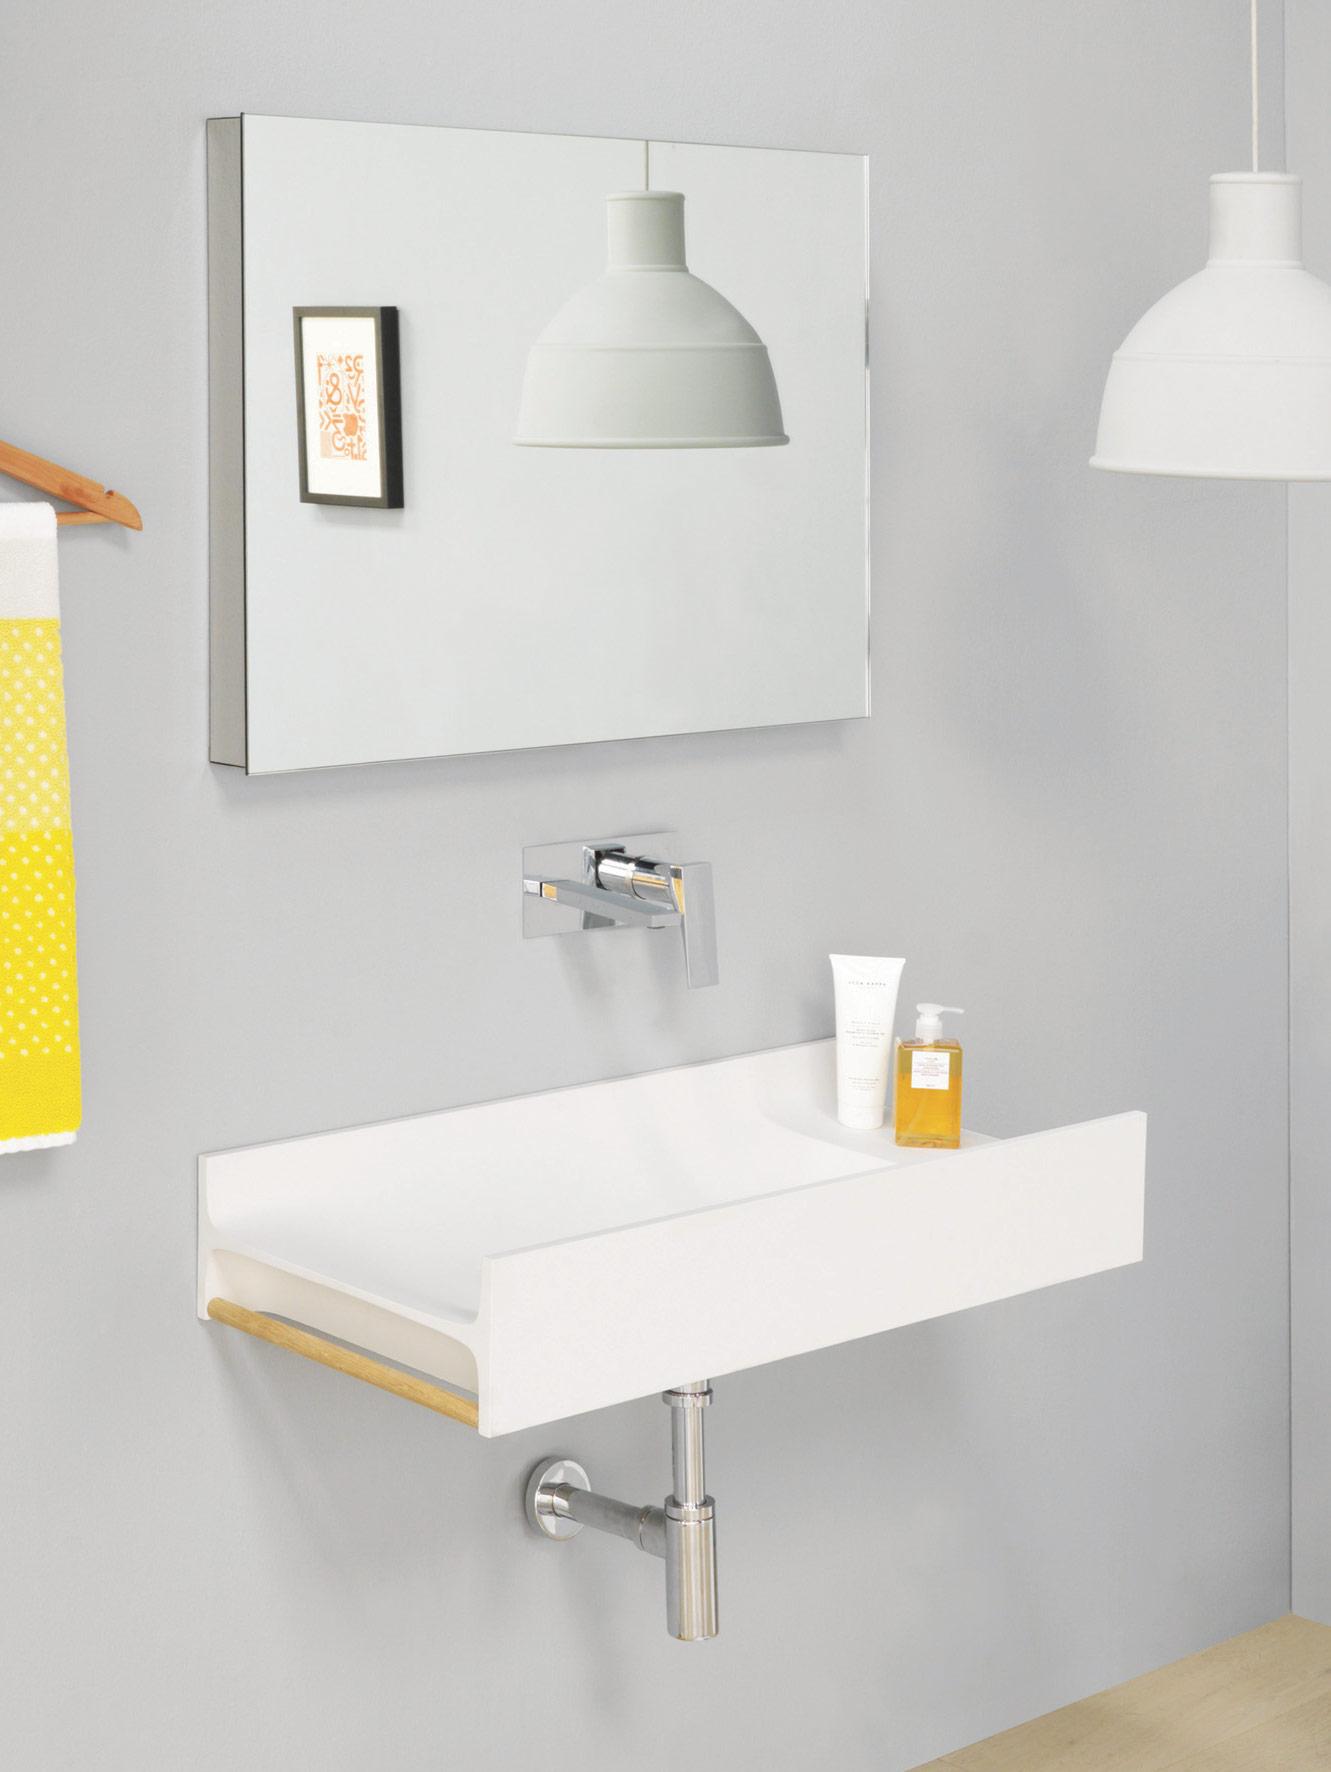 TT washbasin by Meneghello Paolelli Associati for The.Artceram